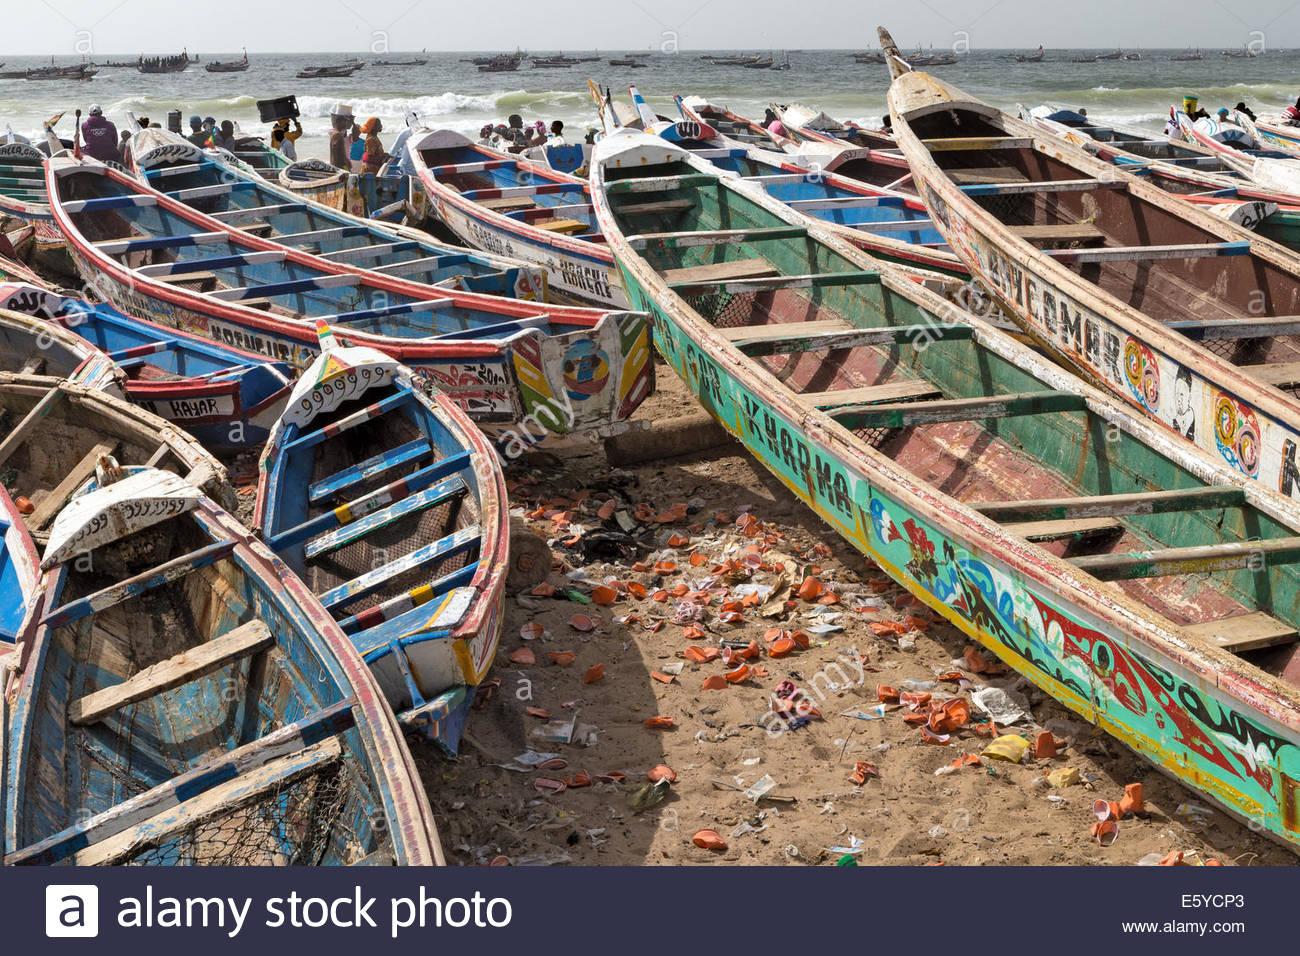 pirogues-fishing-boats-kayar-senegal-E5YCP3.jpg